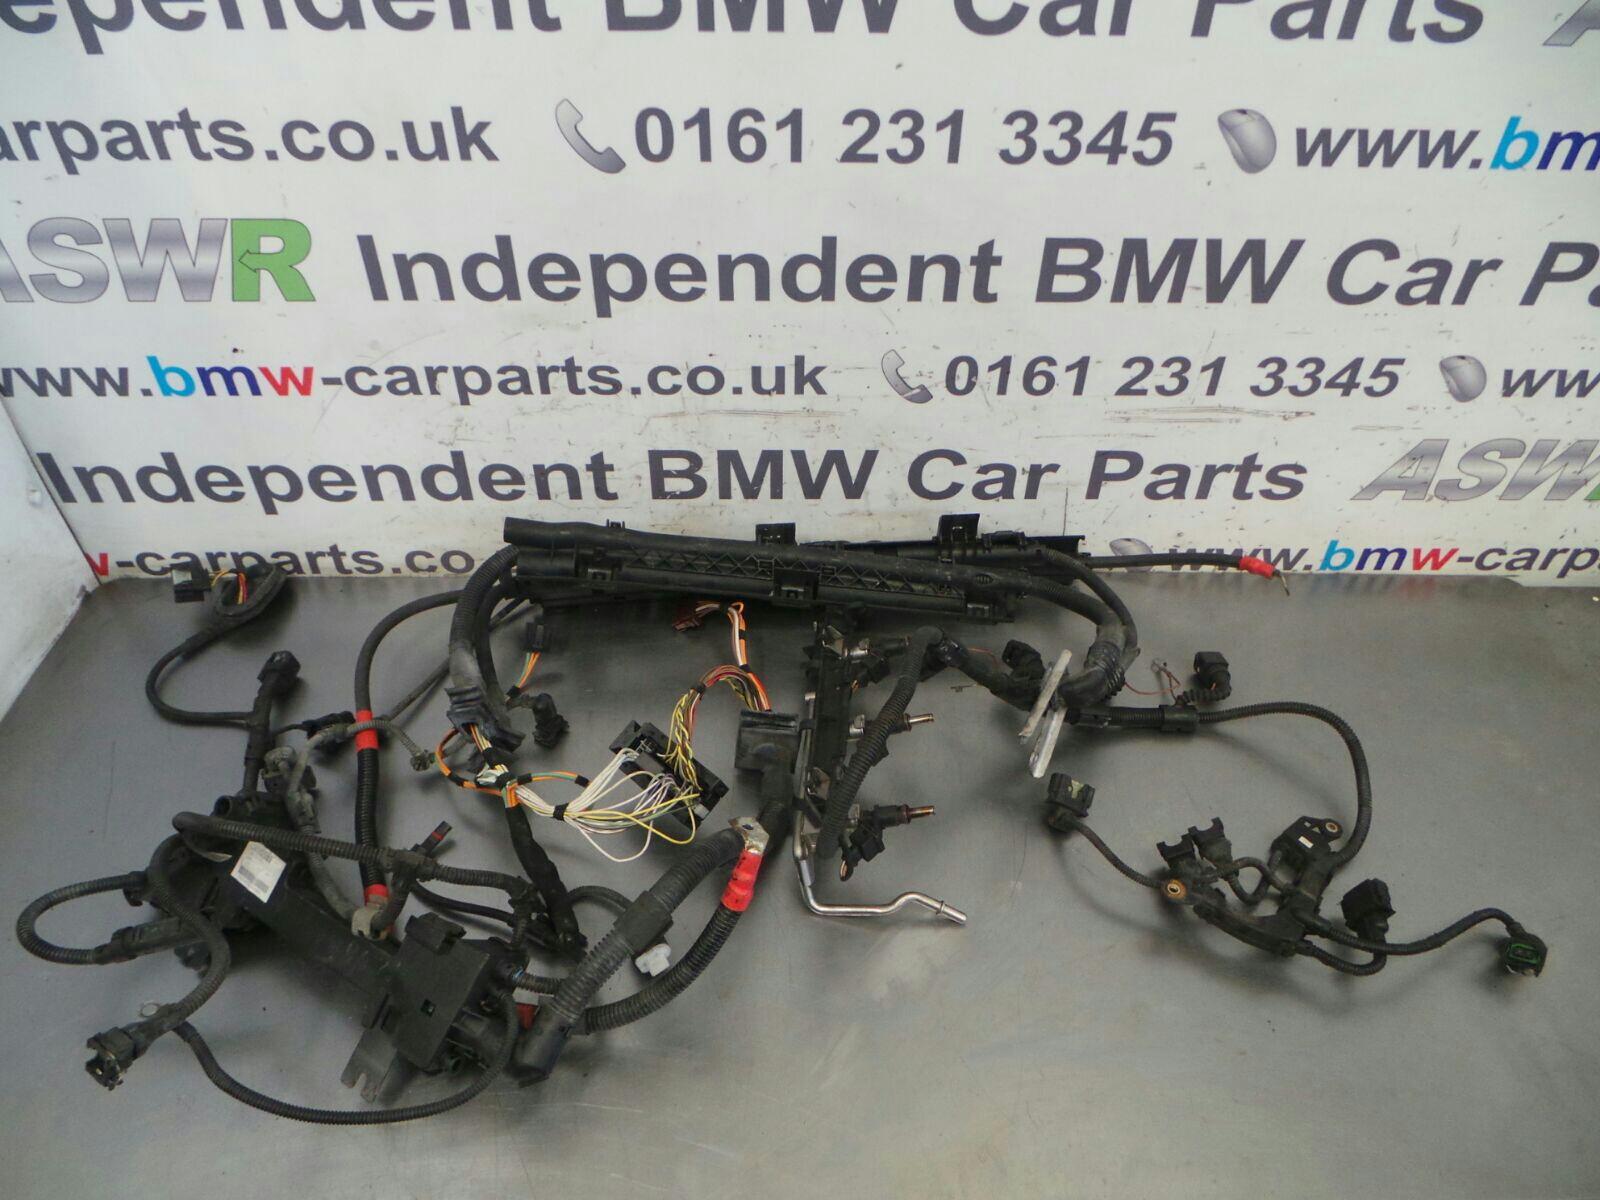 BMW E90 3 SERIES MANUAL Engine Wiring Loom 12517564402 breaking for Bmw N Engine Wiring Harness on bmw e28 engine swap, 1983 bmw 320i engine, bmw 535i engine, bmw m52 engine, bmw m40 engine, 98 bmw 528i engine, bmw s38 engine, bmw n42 engine, bmw m42 engine, bmw m50 engine, bmw m44 engine, bmw m57 engine, bmw m43 engine,